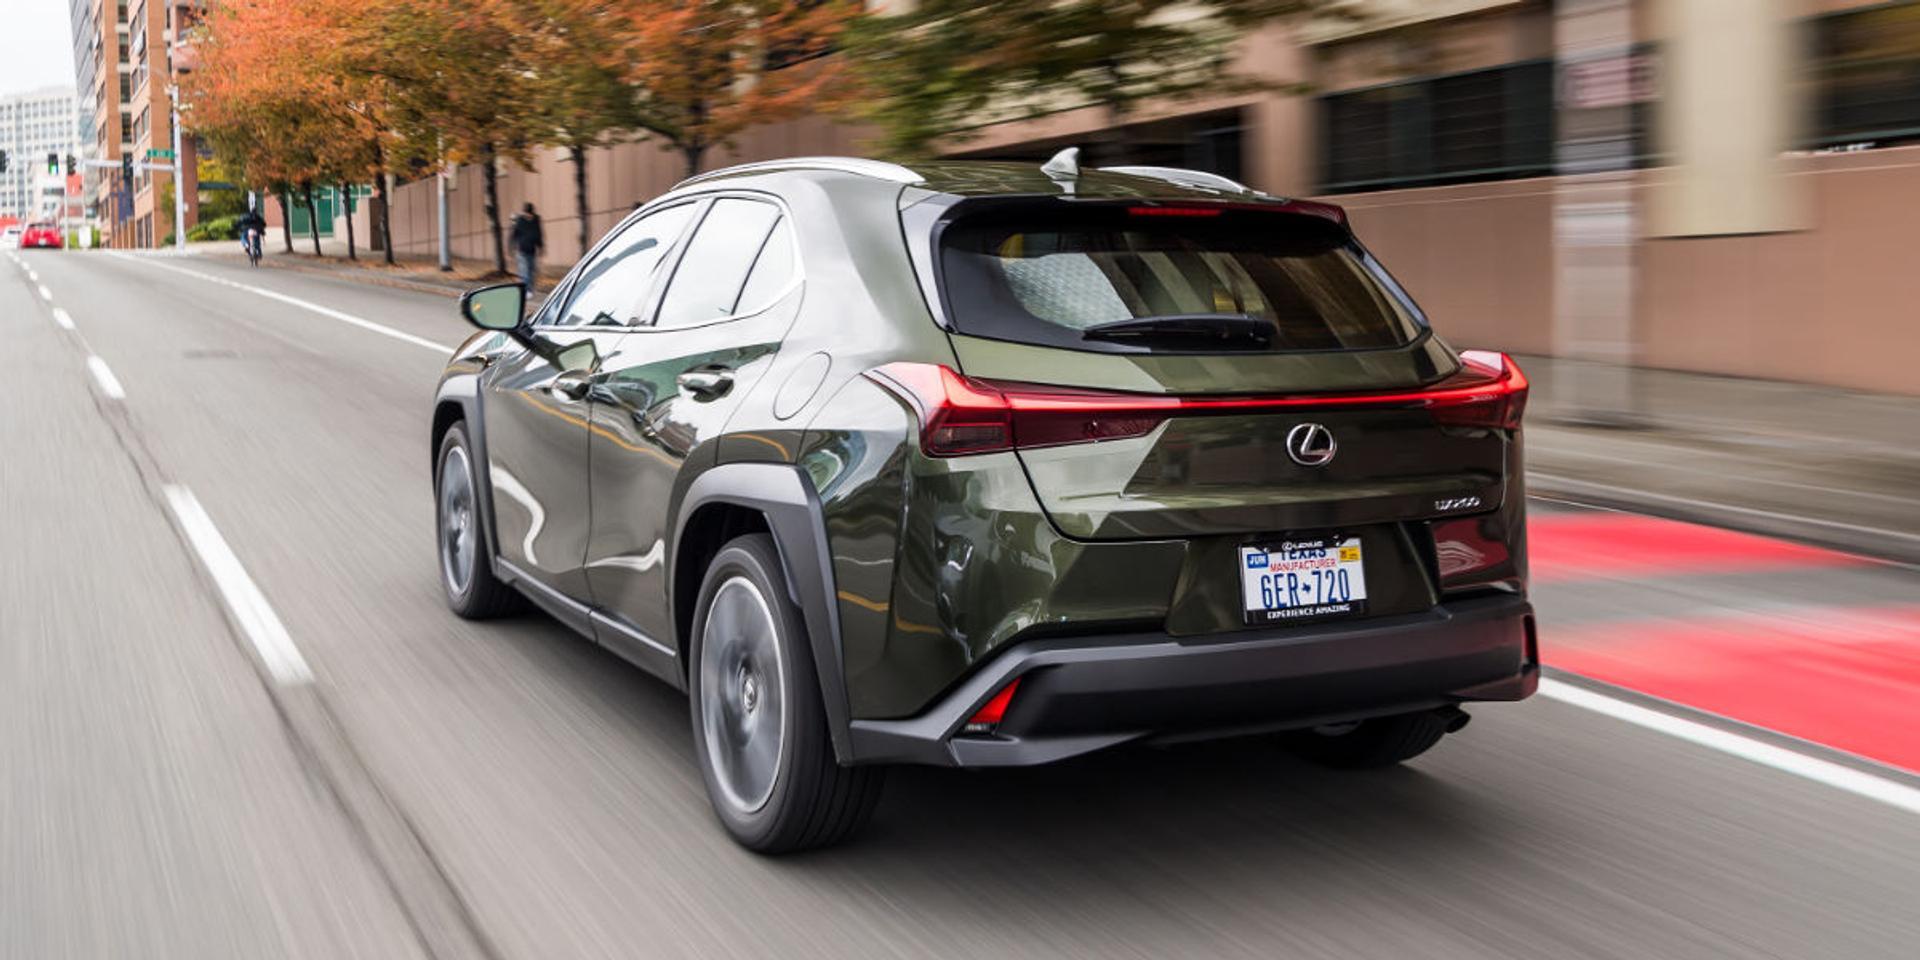 Lexus UX rear view